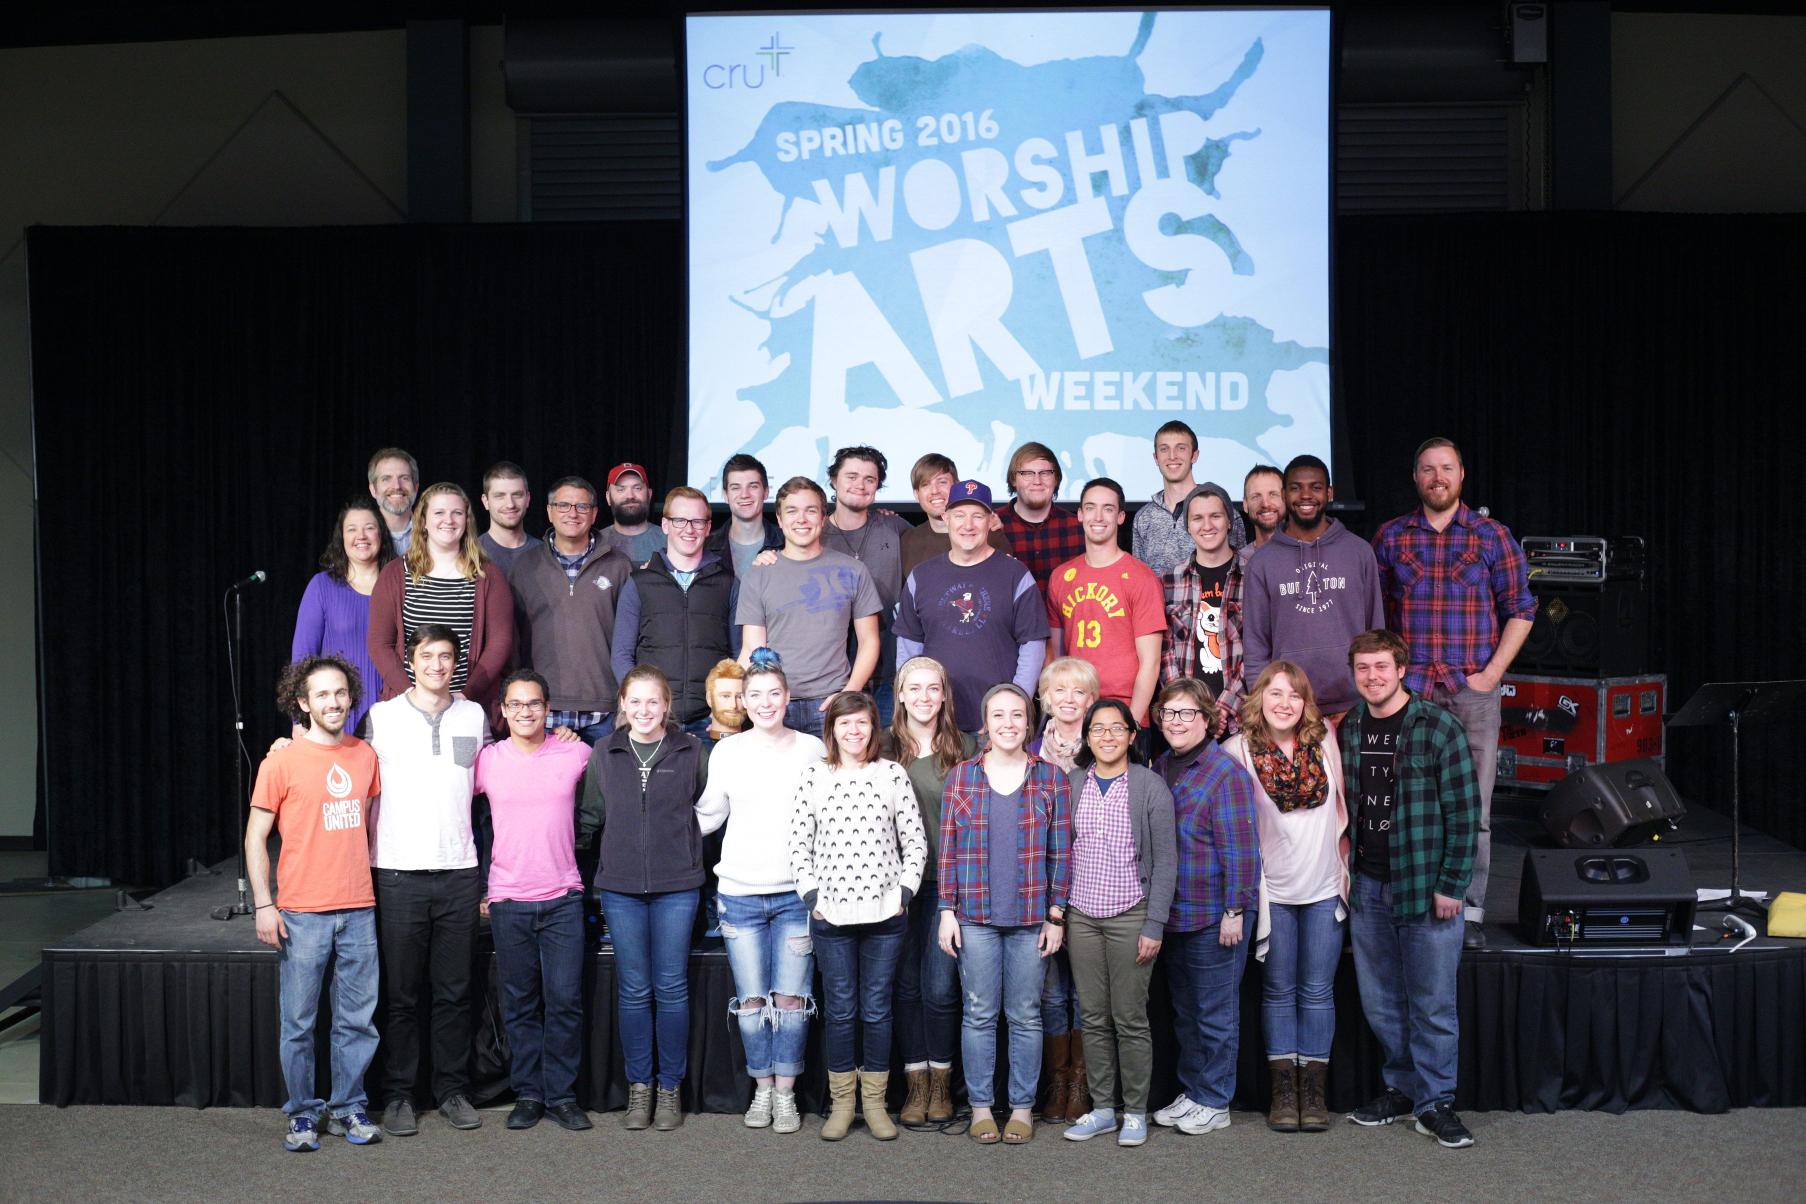 worship-arts-weekend